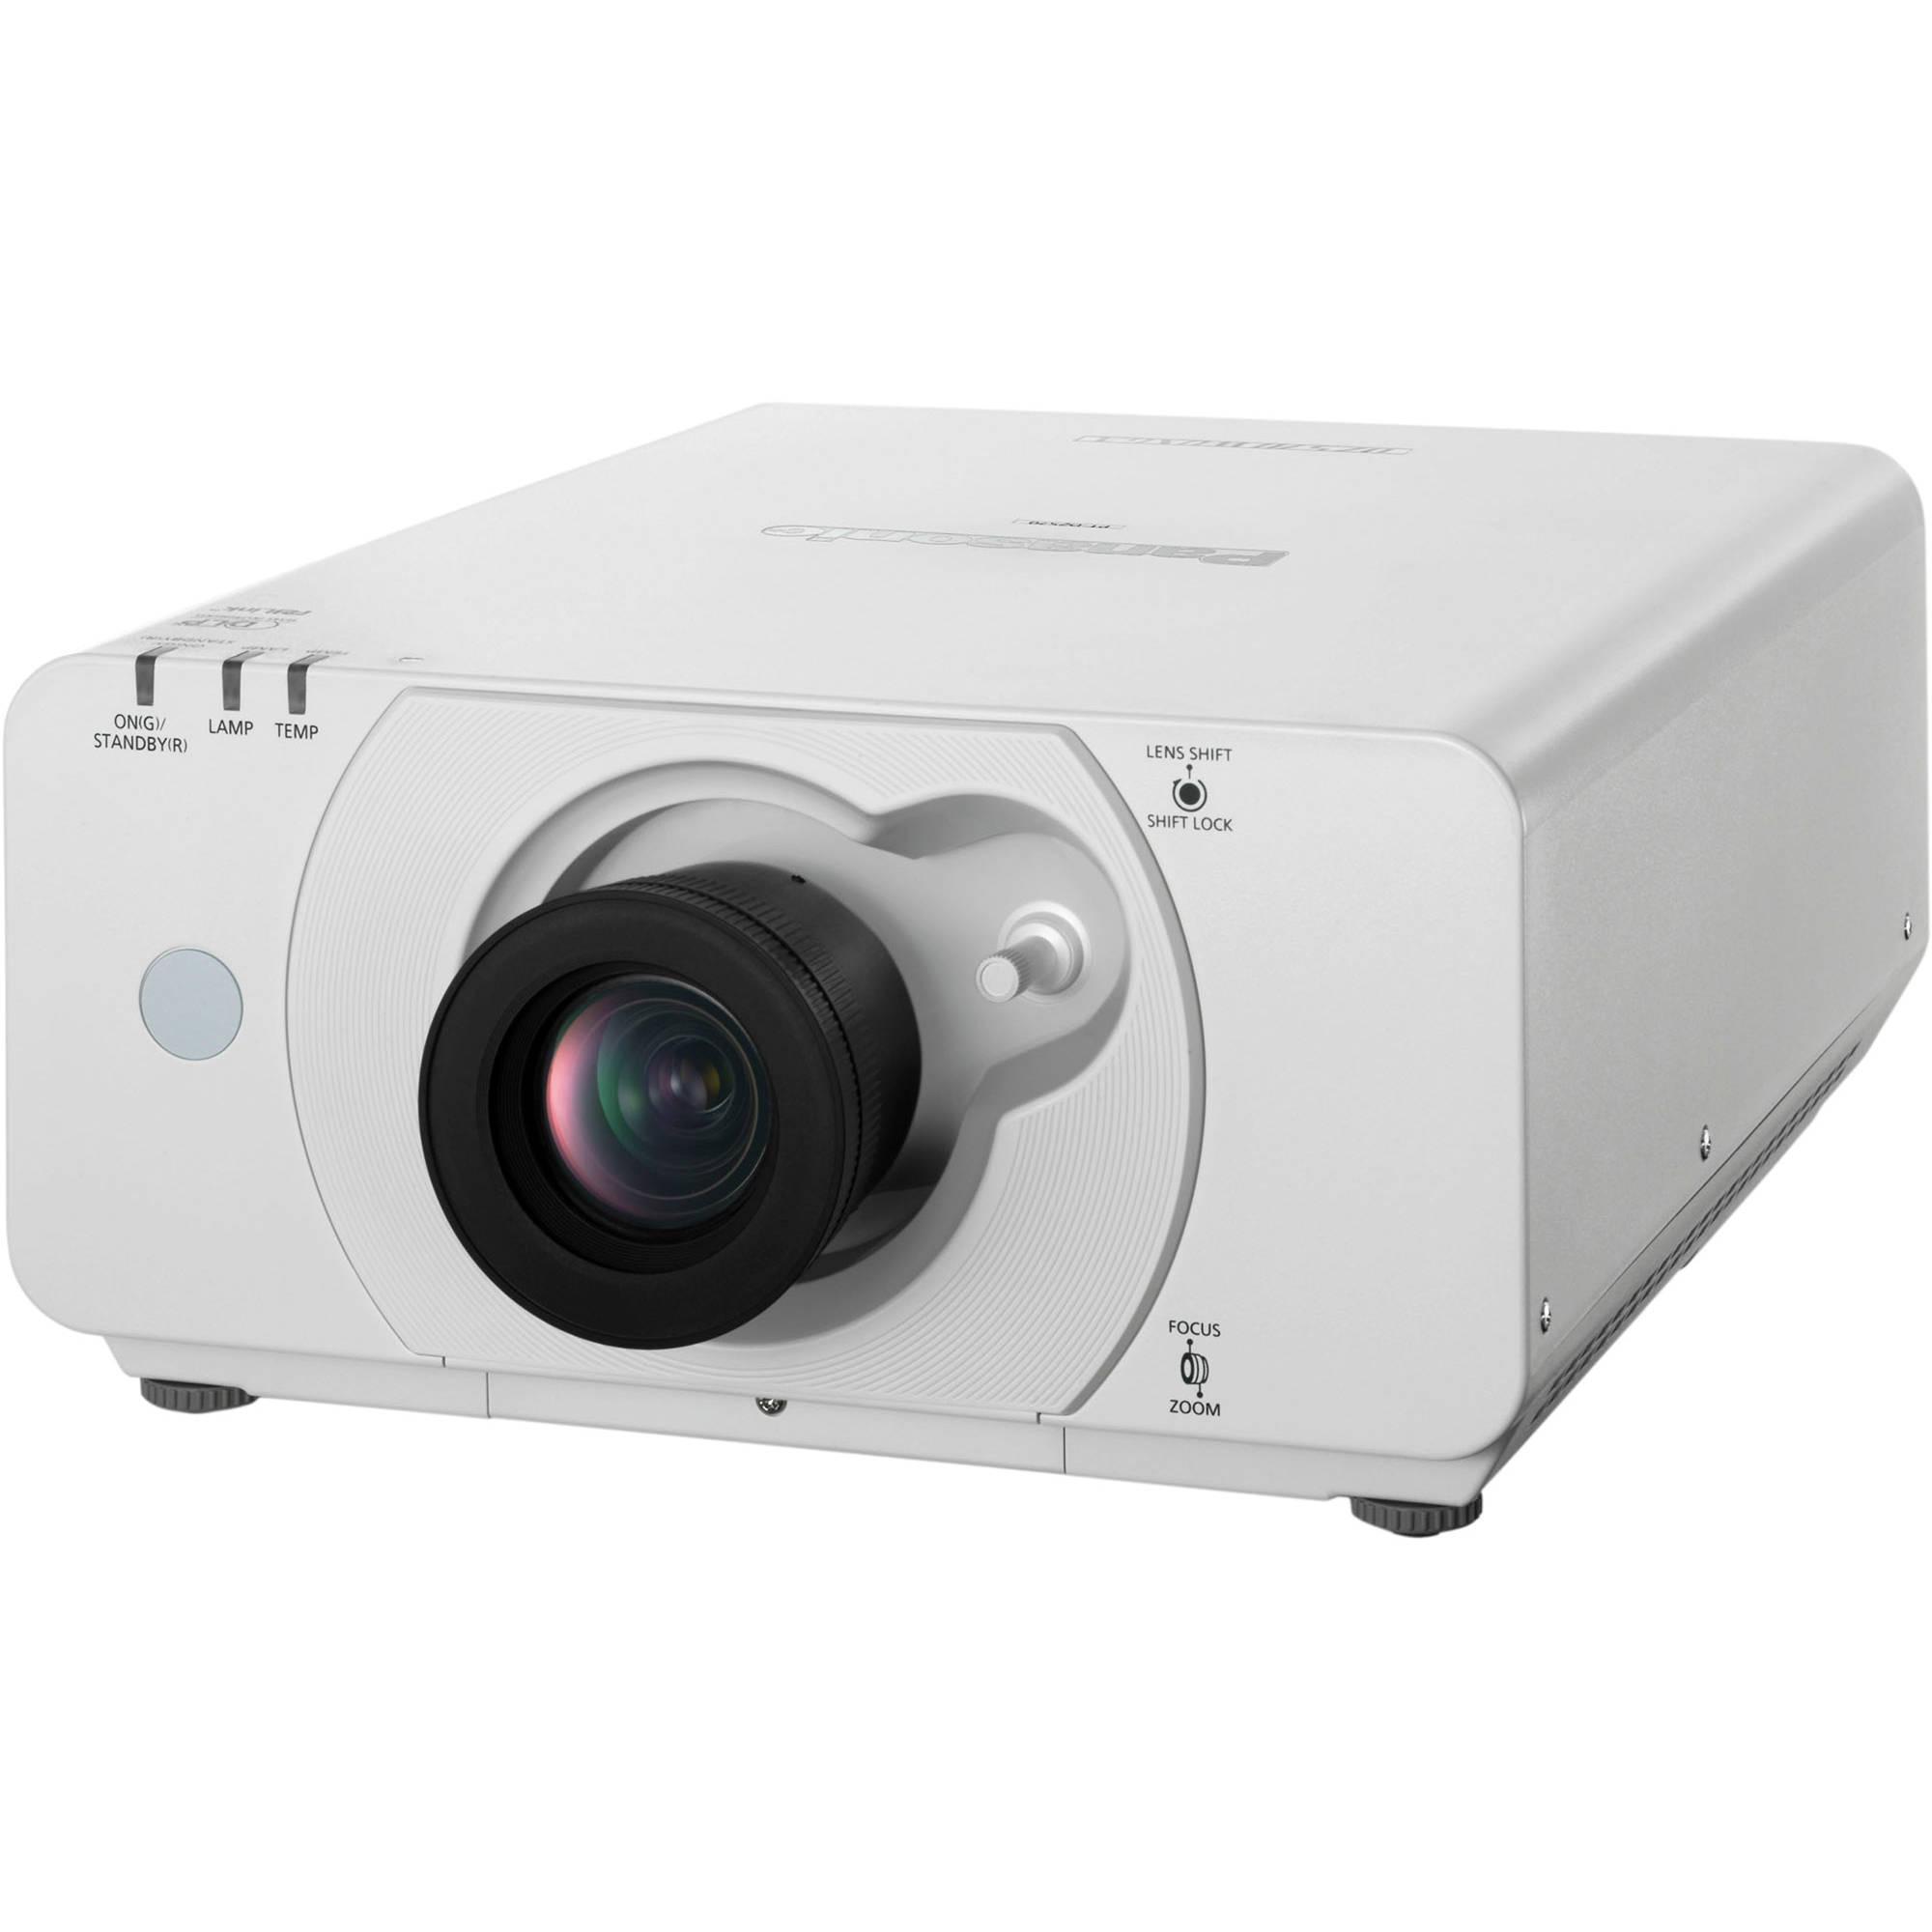 Panasonic PT-DW530U WXGA Projector PT-DW530U B&H Photo Video